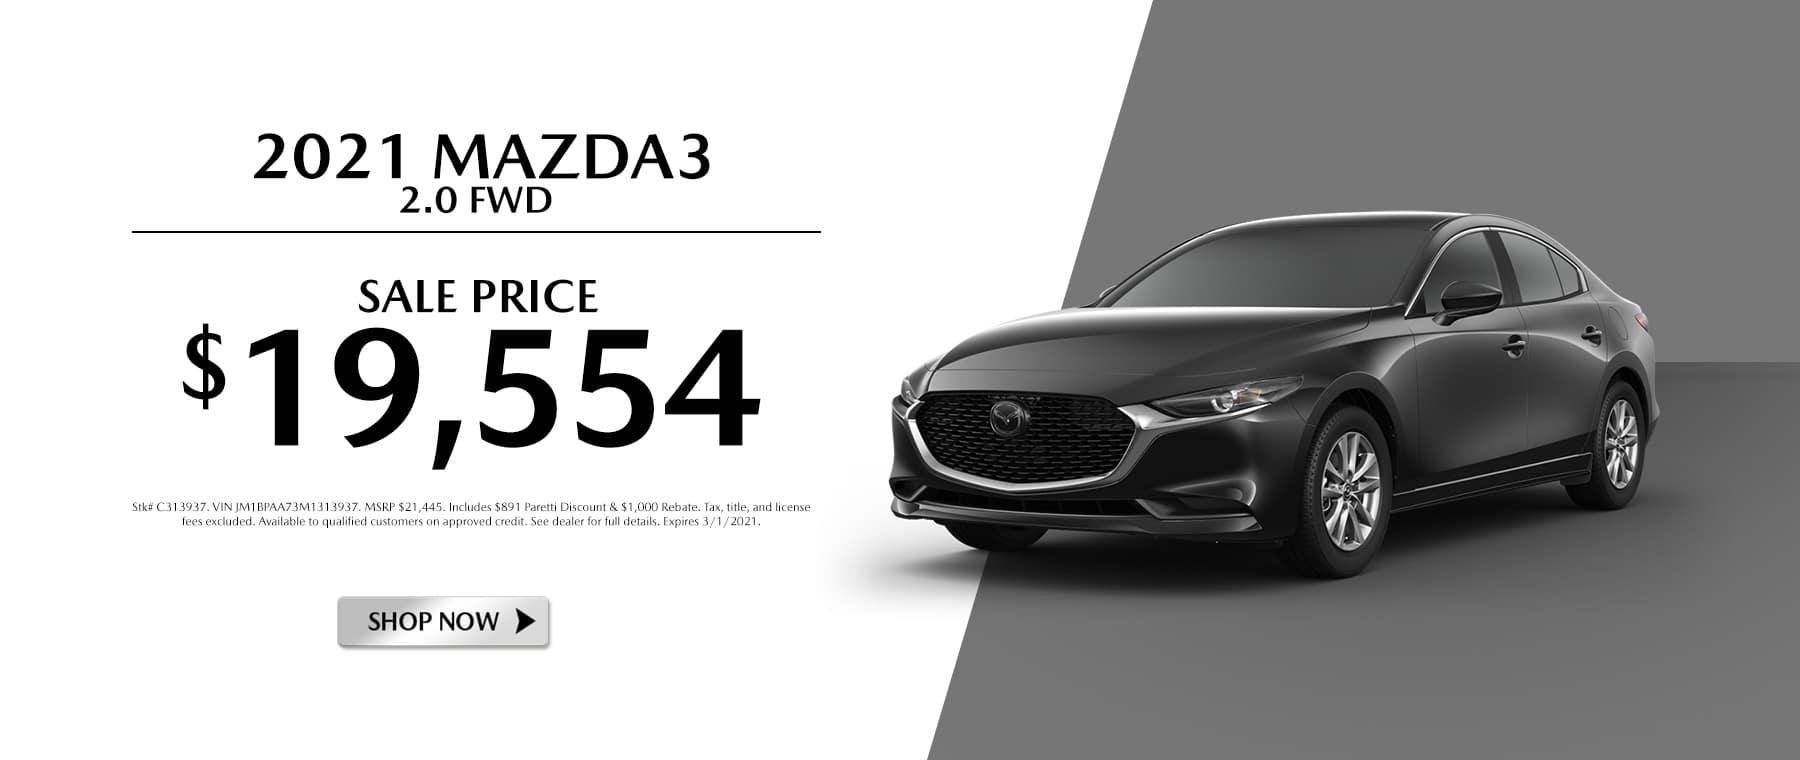 ParettiMazda_1800x760_2-21_Mazda3